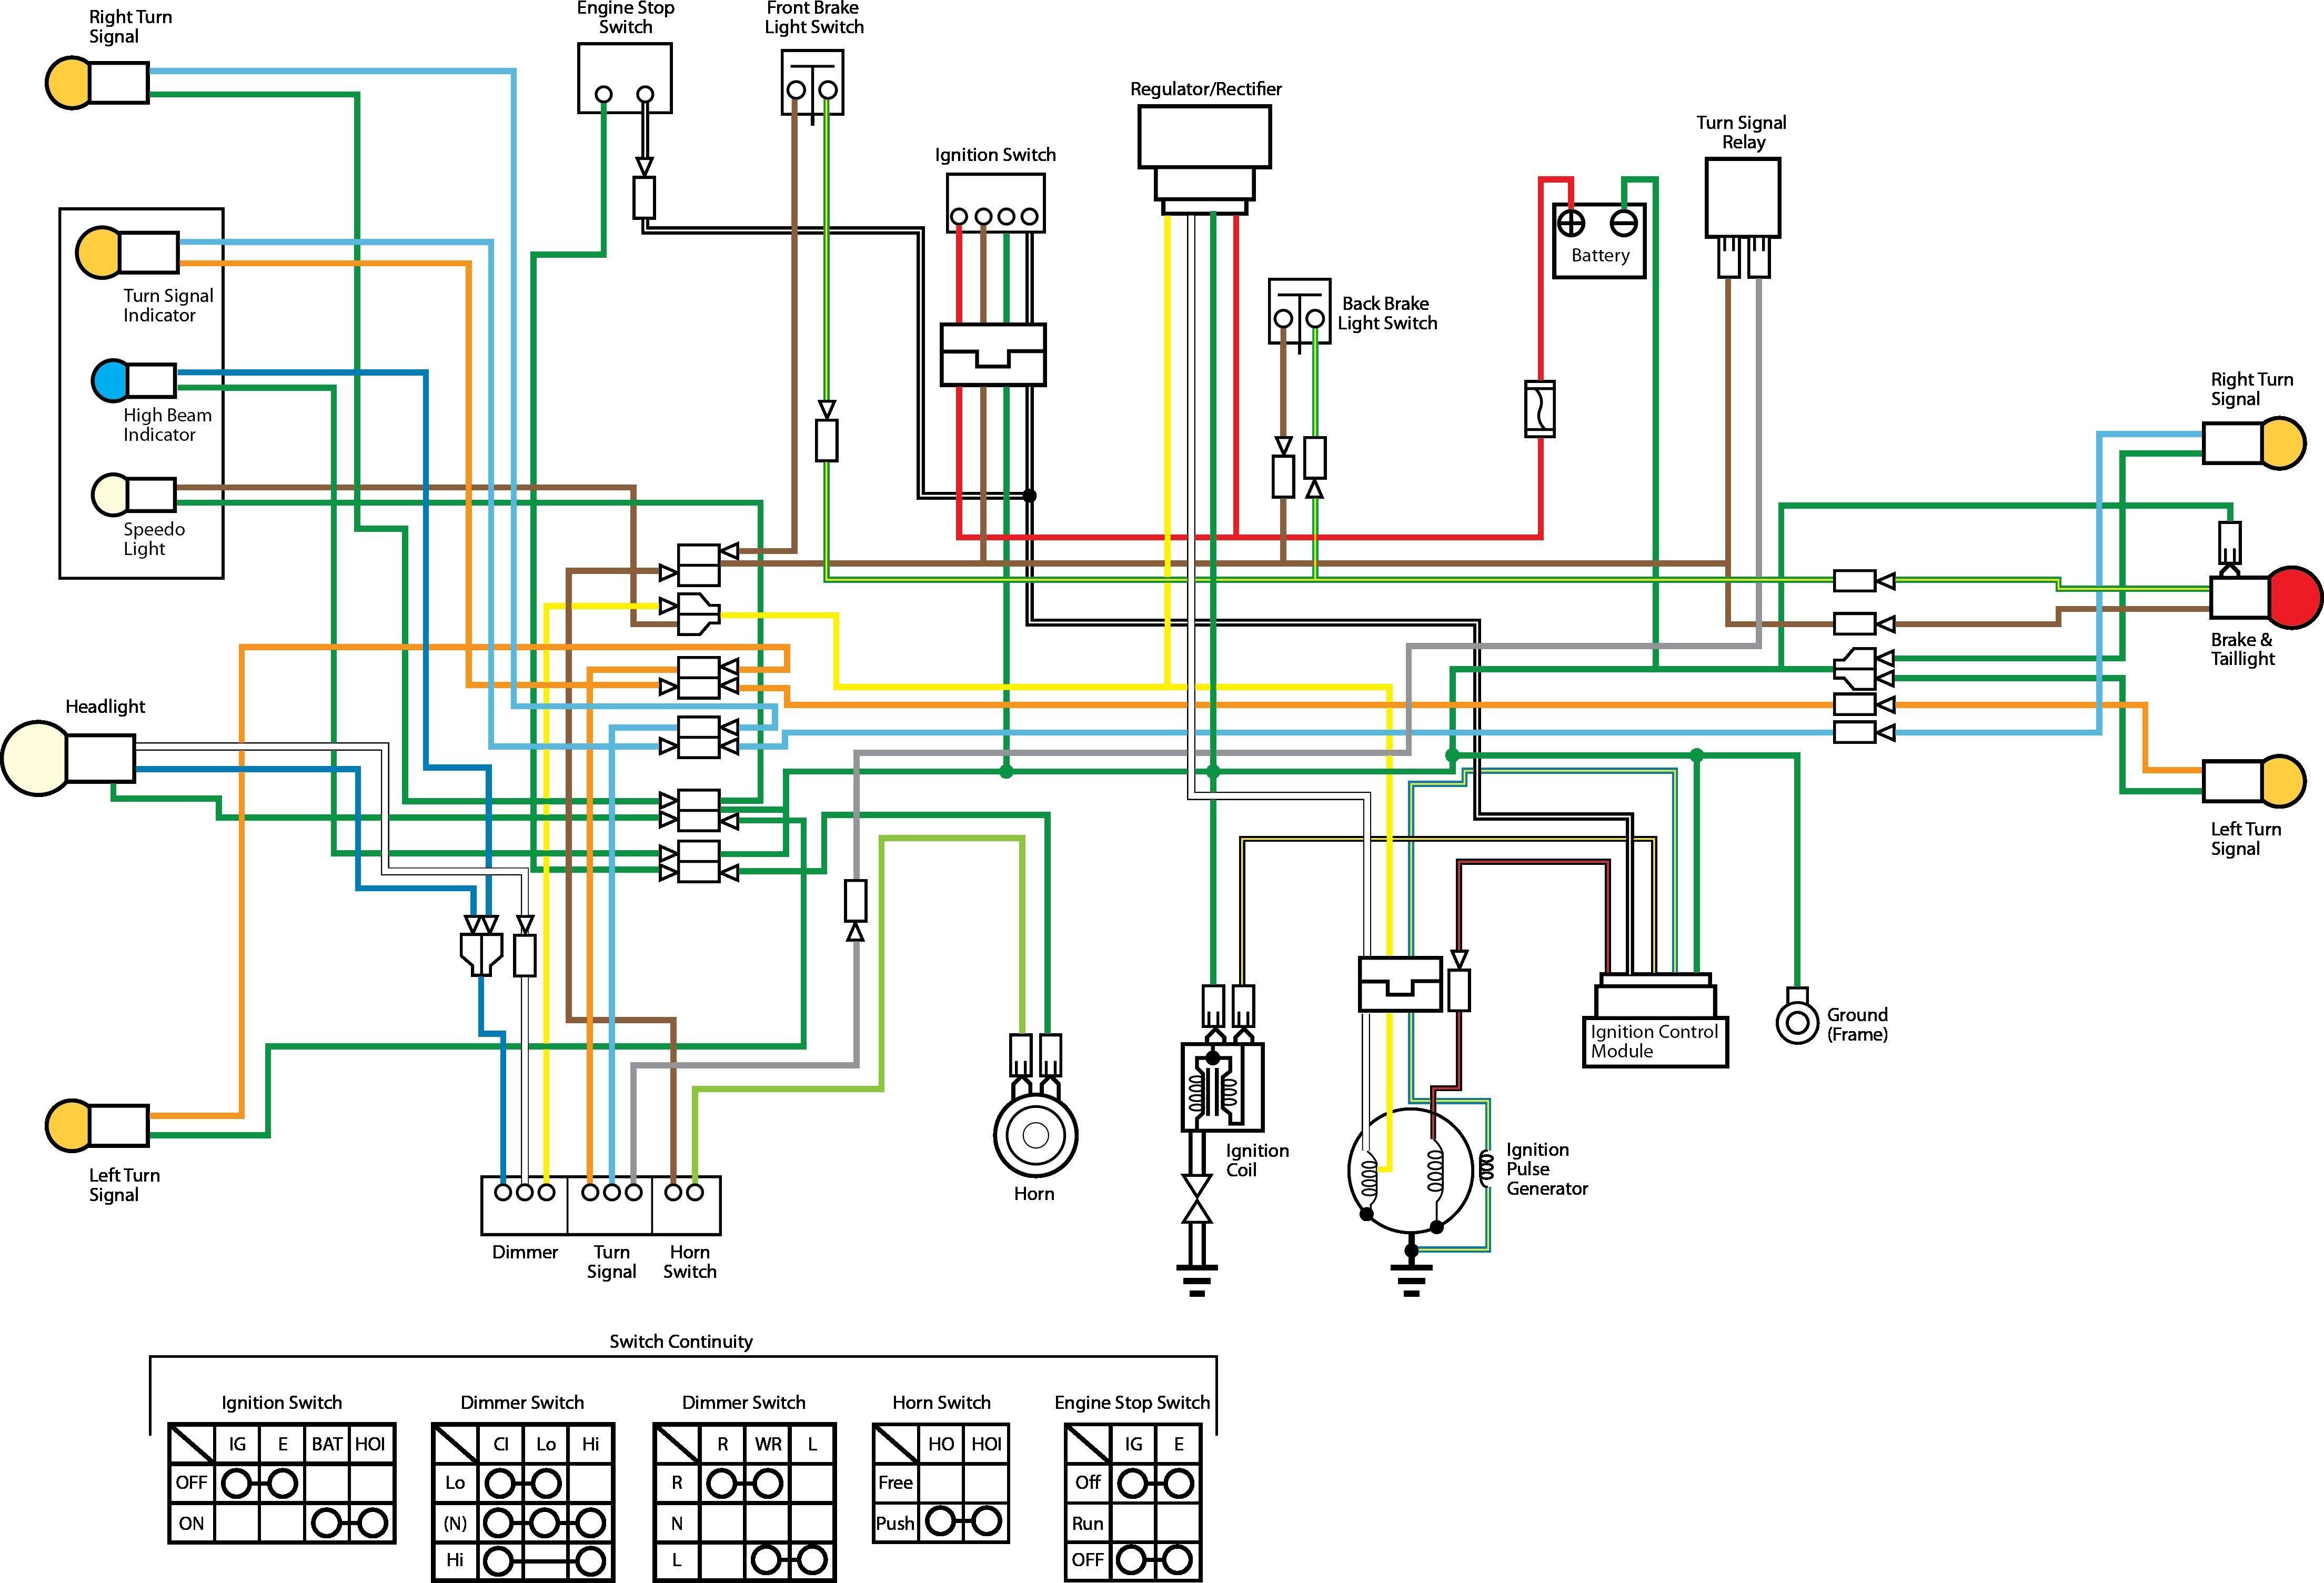 24 Complex Hero Honda Wiring Diagram Design Ideas Https Bacamajalah Com 24 Complex Hero Hond Motorcycle Wiring Electrical Wiring Diagram Electrical Diagram